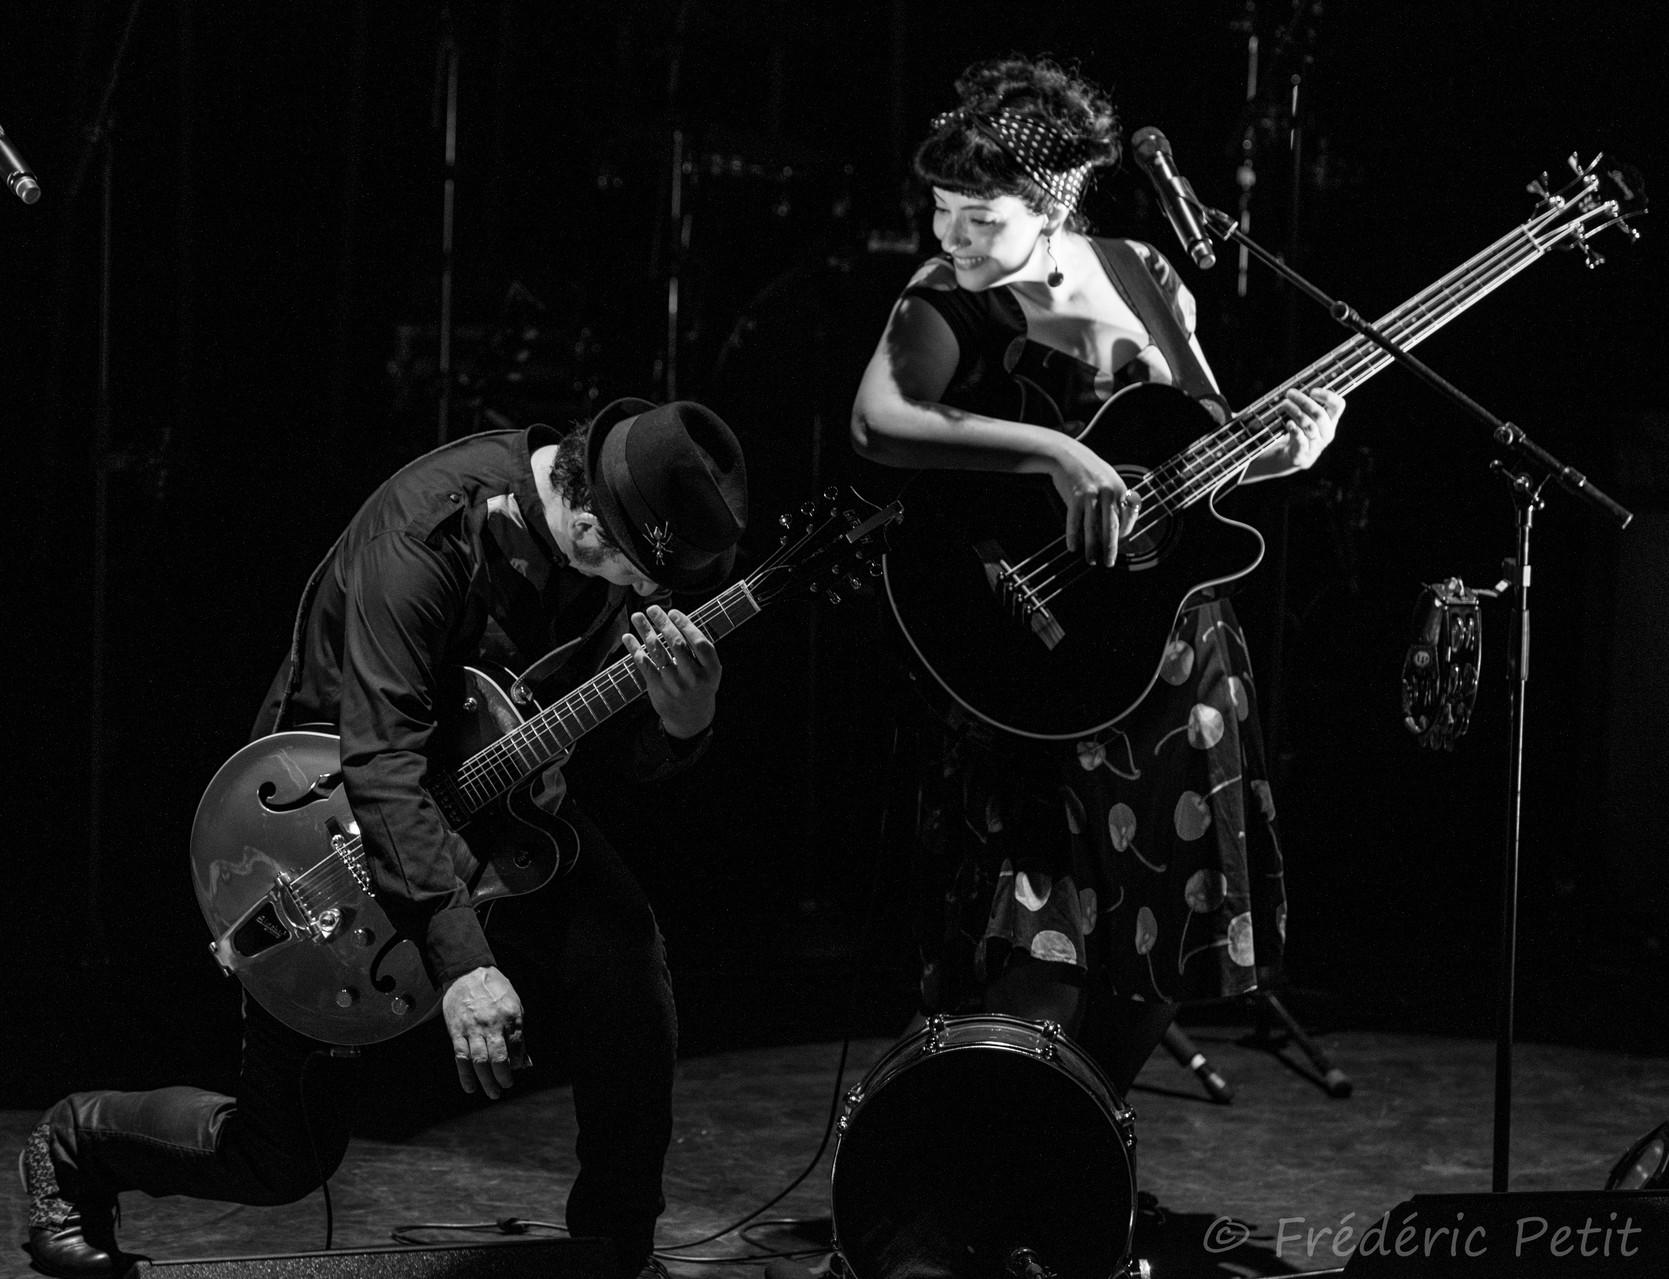 7 octobre 2014 - Lili Cros & Thierry Chazelle @ Espace Jean Vilar (Festi'Val de Marne)